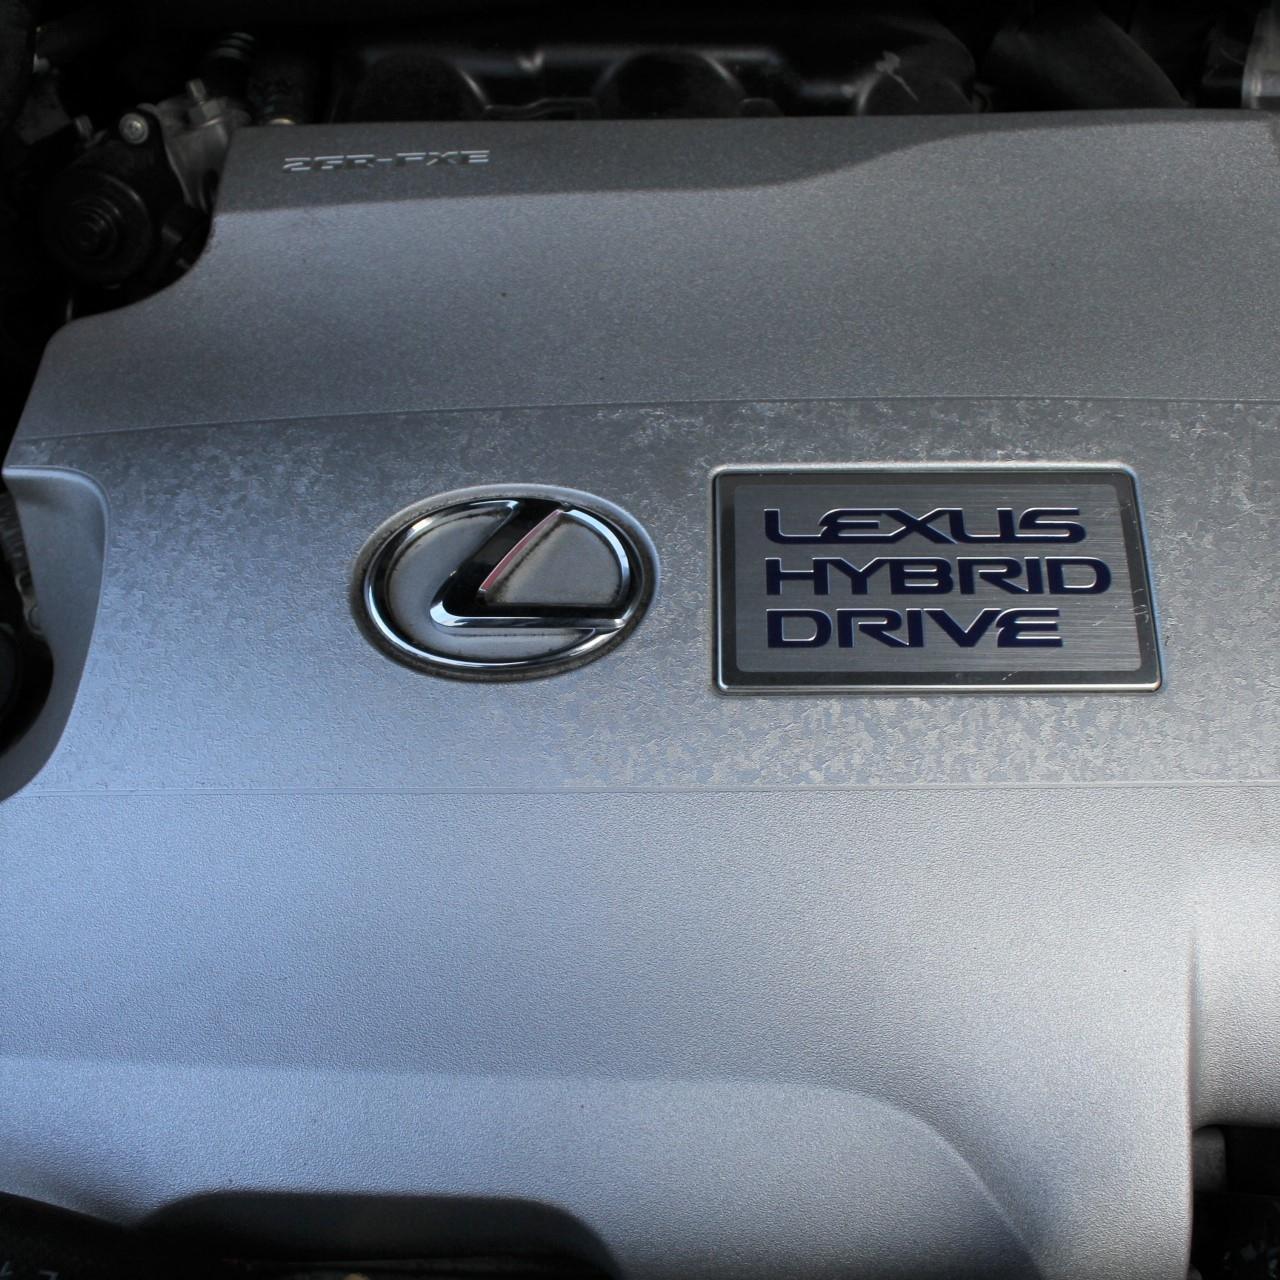 LEXUS RX SERIES, Engine, PETROL, 3.5, 2GR-FXE, GGL1#, RX450H, HYBRID TYPE, 03/09-09/15